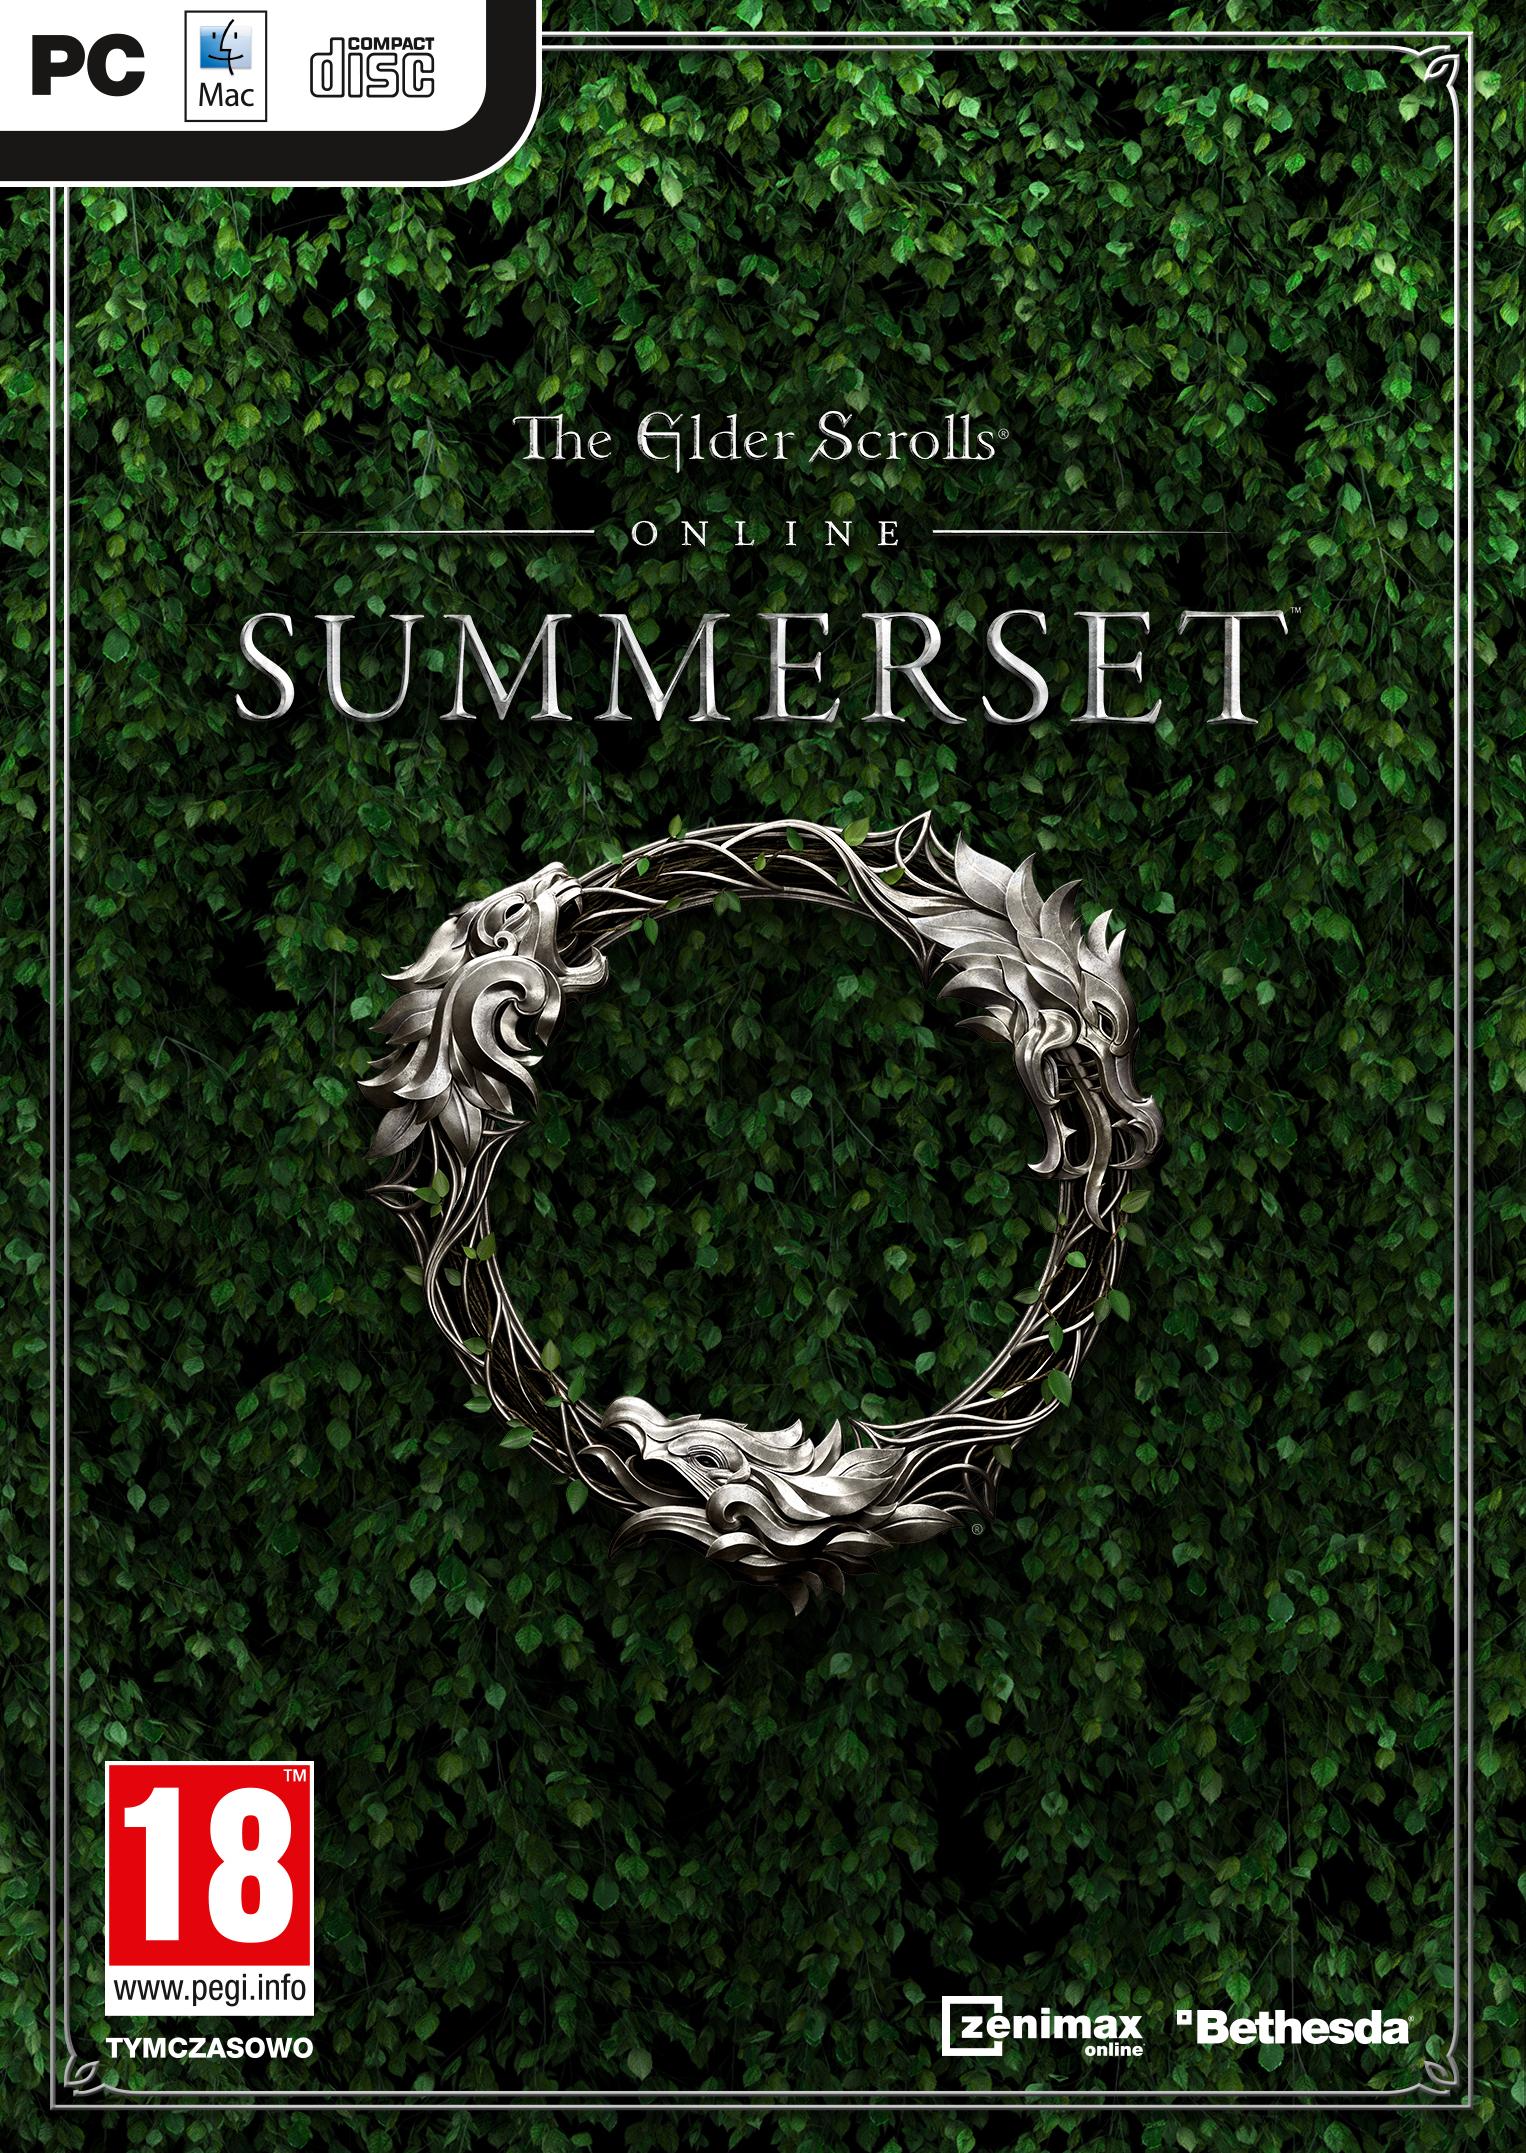 The Elder Scrolls Online - Summerset (PC/MAC) DIGITAL